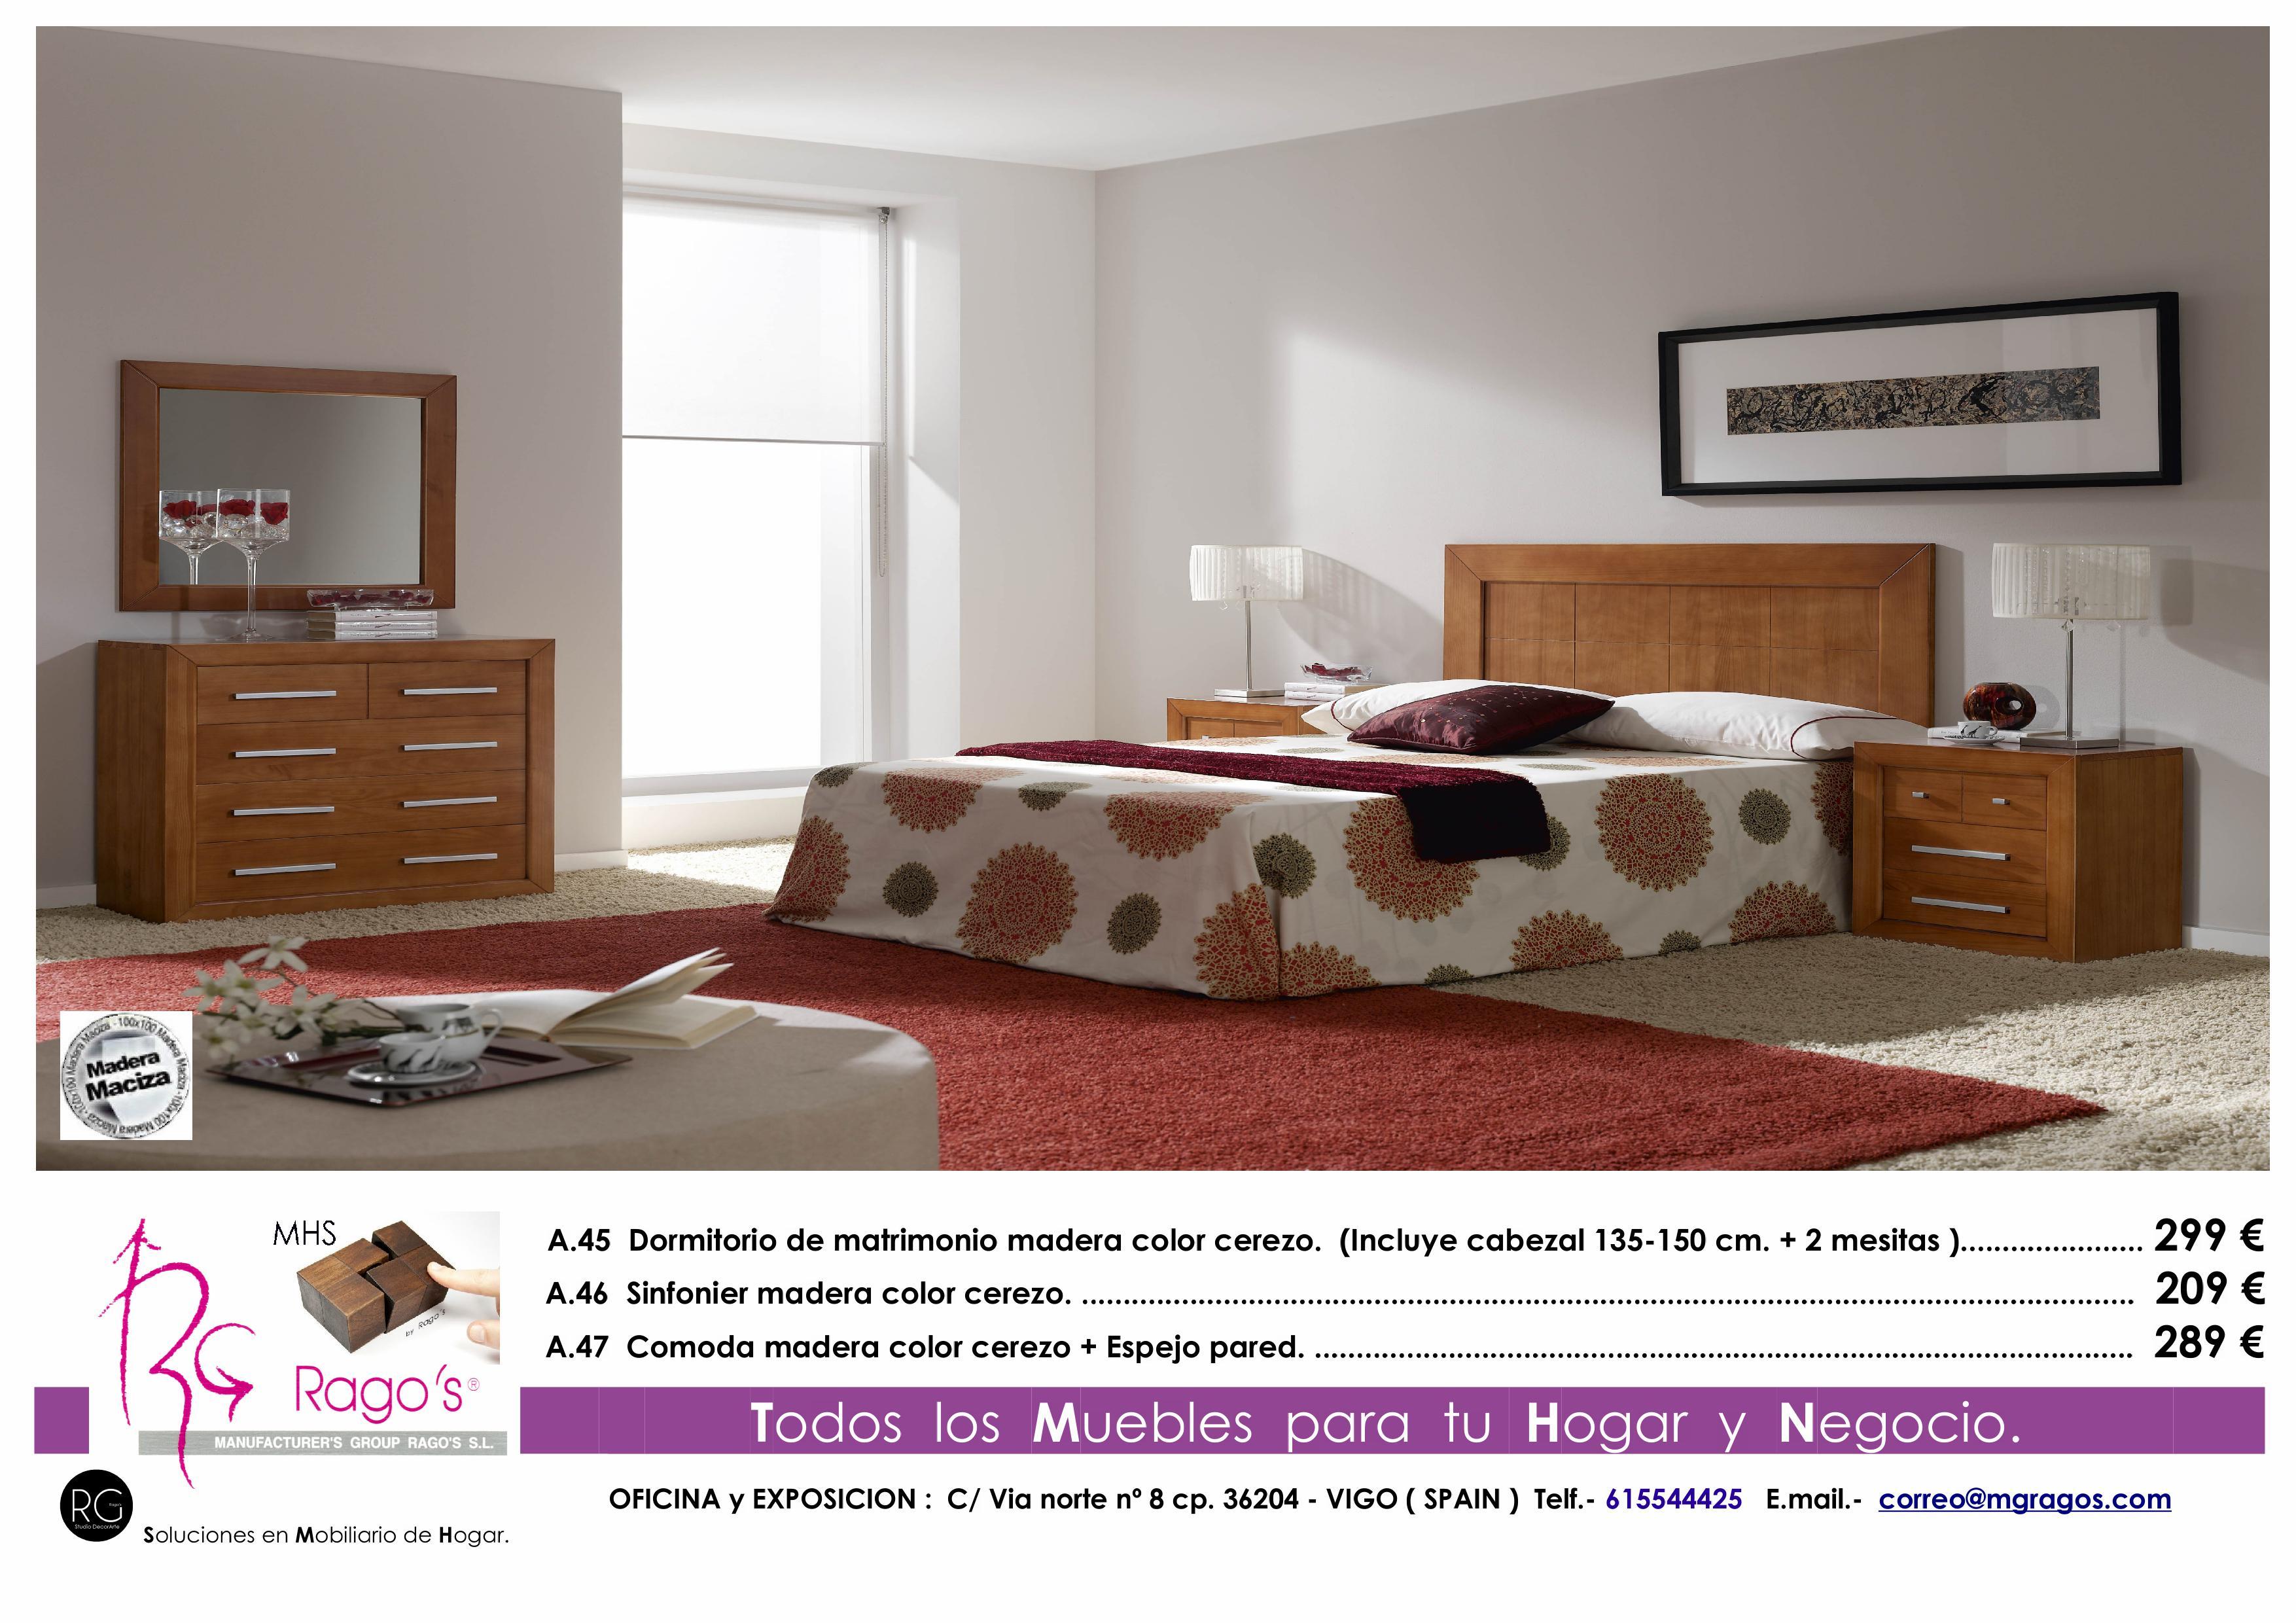 A.45-A.46-A.47 Dormitorio (Cabezal+Mesitas-Comoda+Espejo-Sinfonier) Pag. nº 6